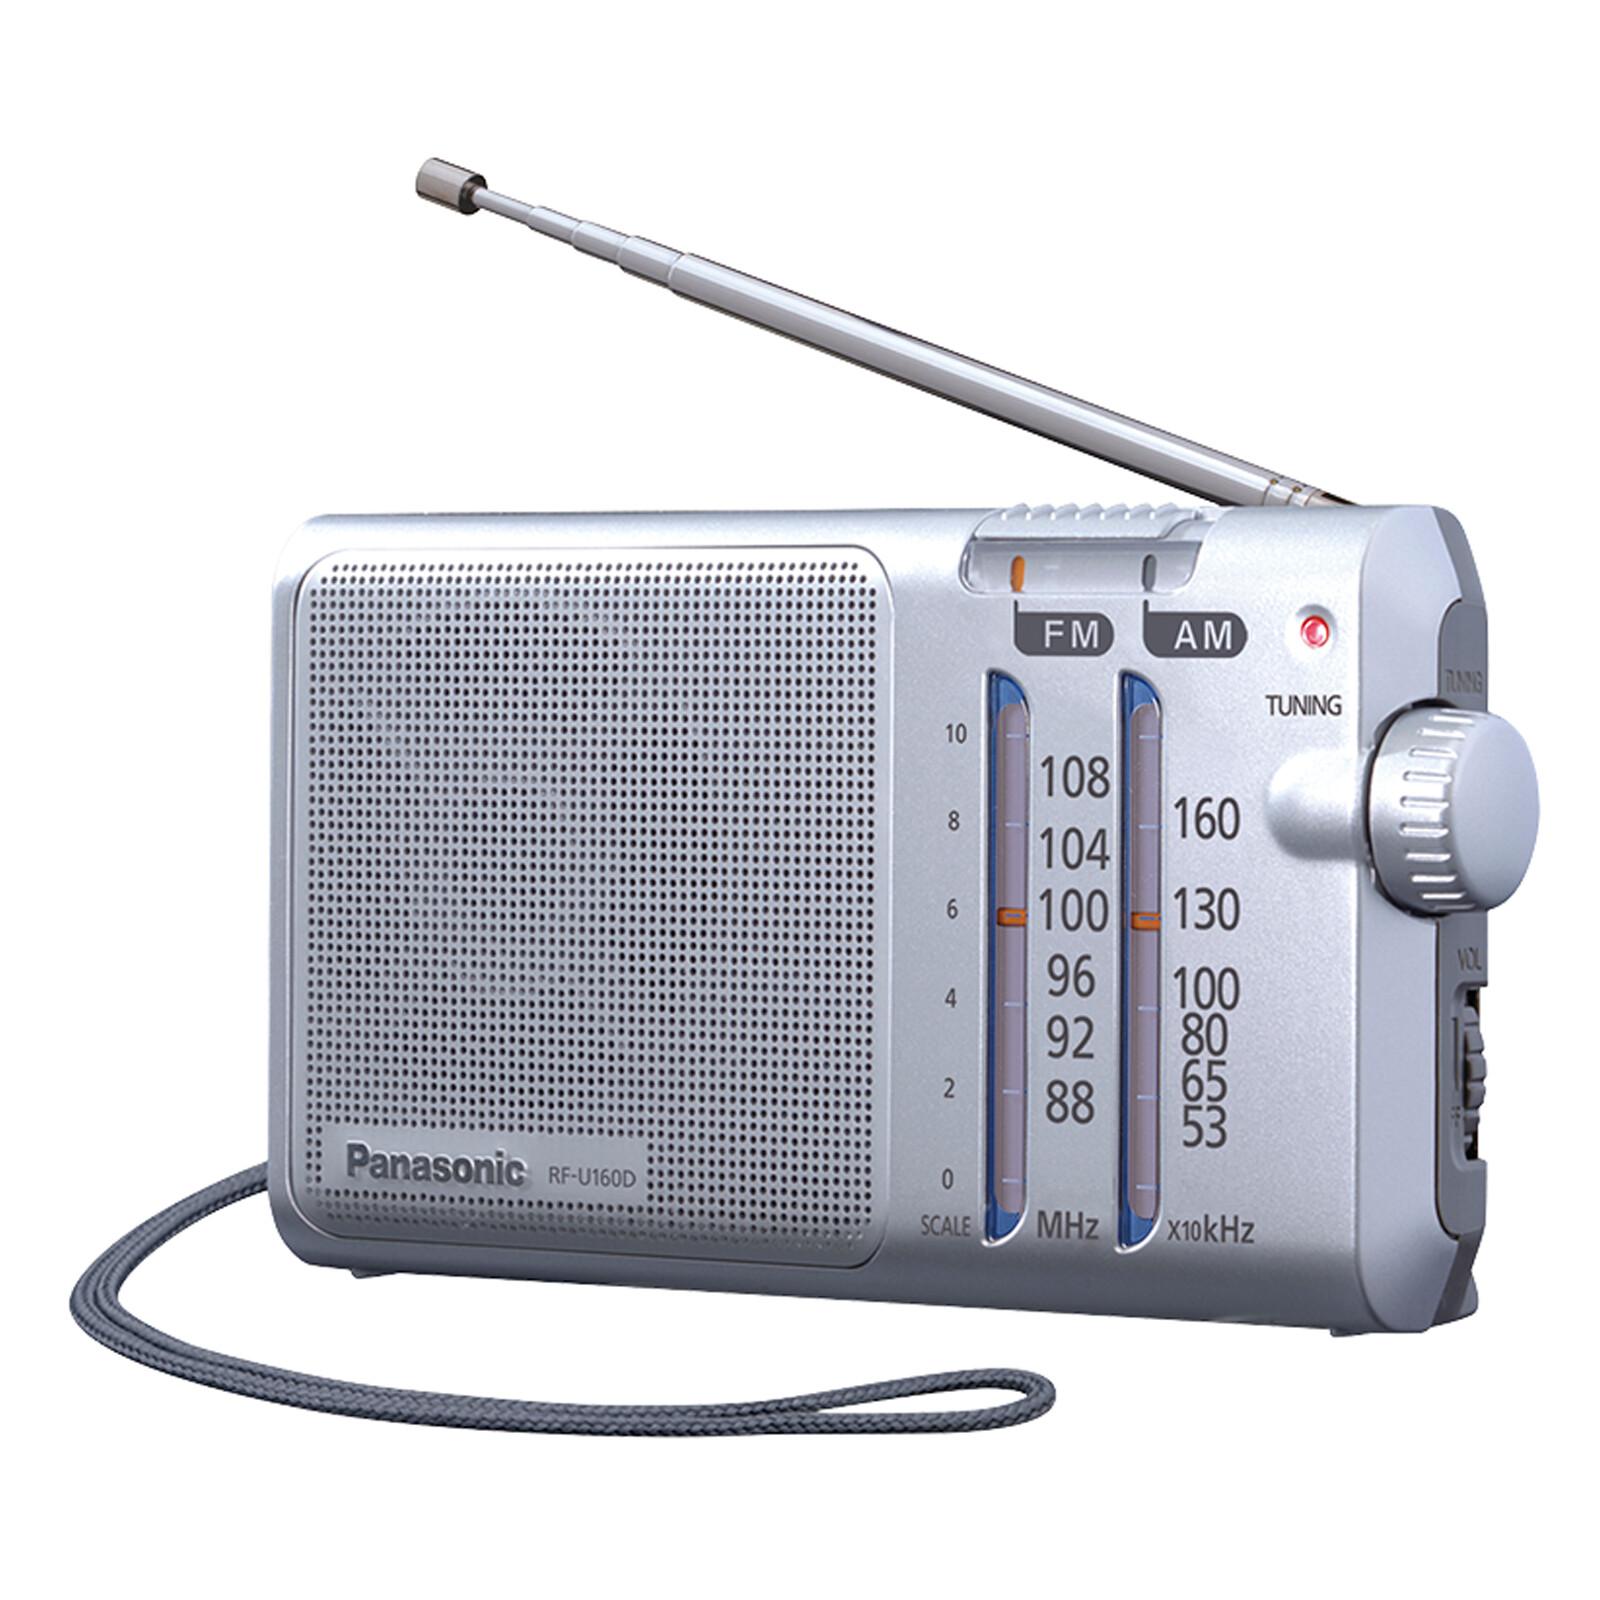 Panasonic RF-U160DEG-S Radio